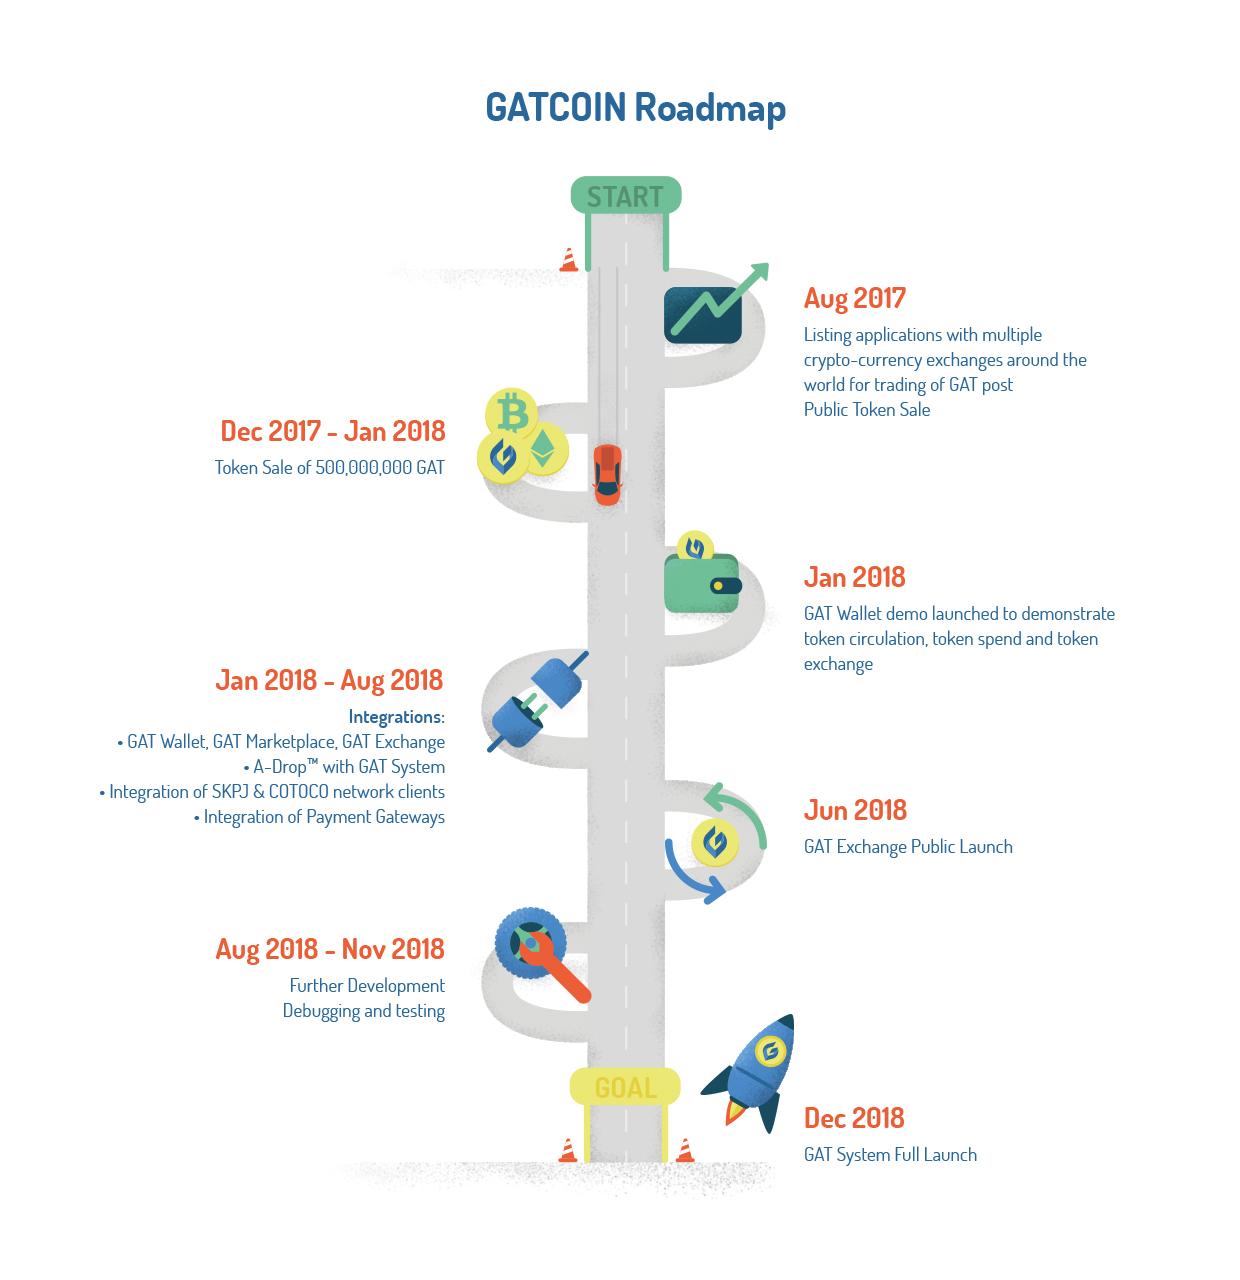 GATCOIN_Roadmap_150dpi_RGB_02